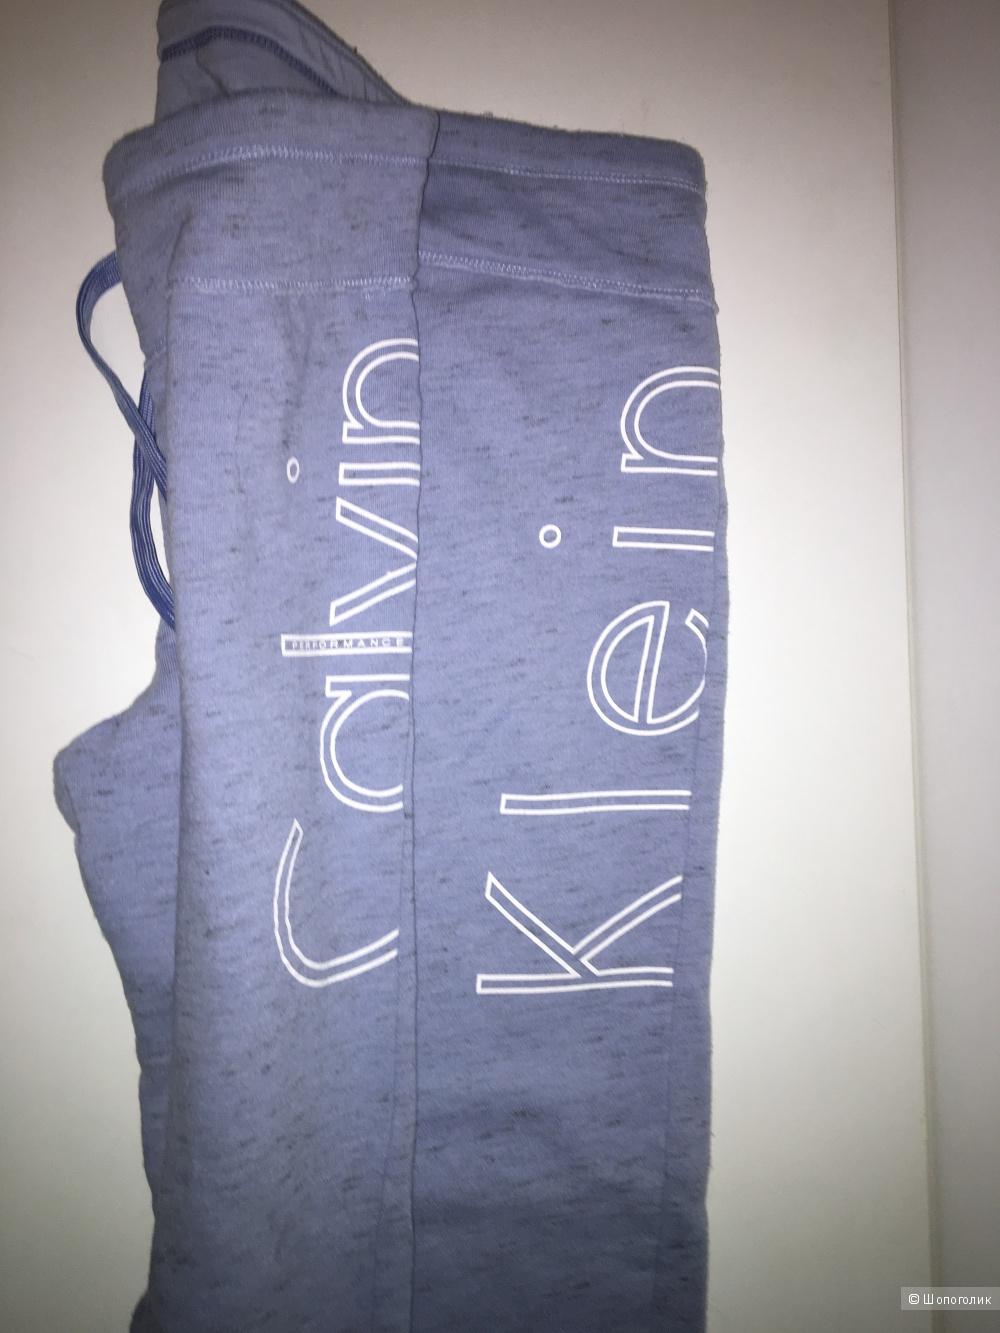 Спортивные штаны / трико Calvin Klein размер M-L